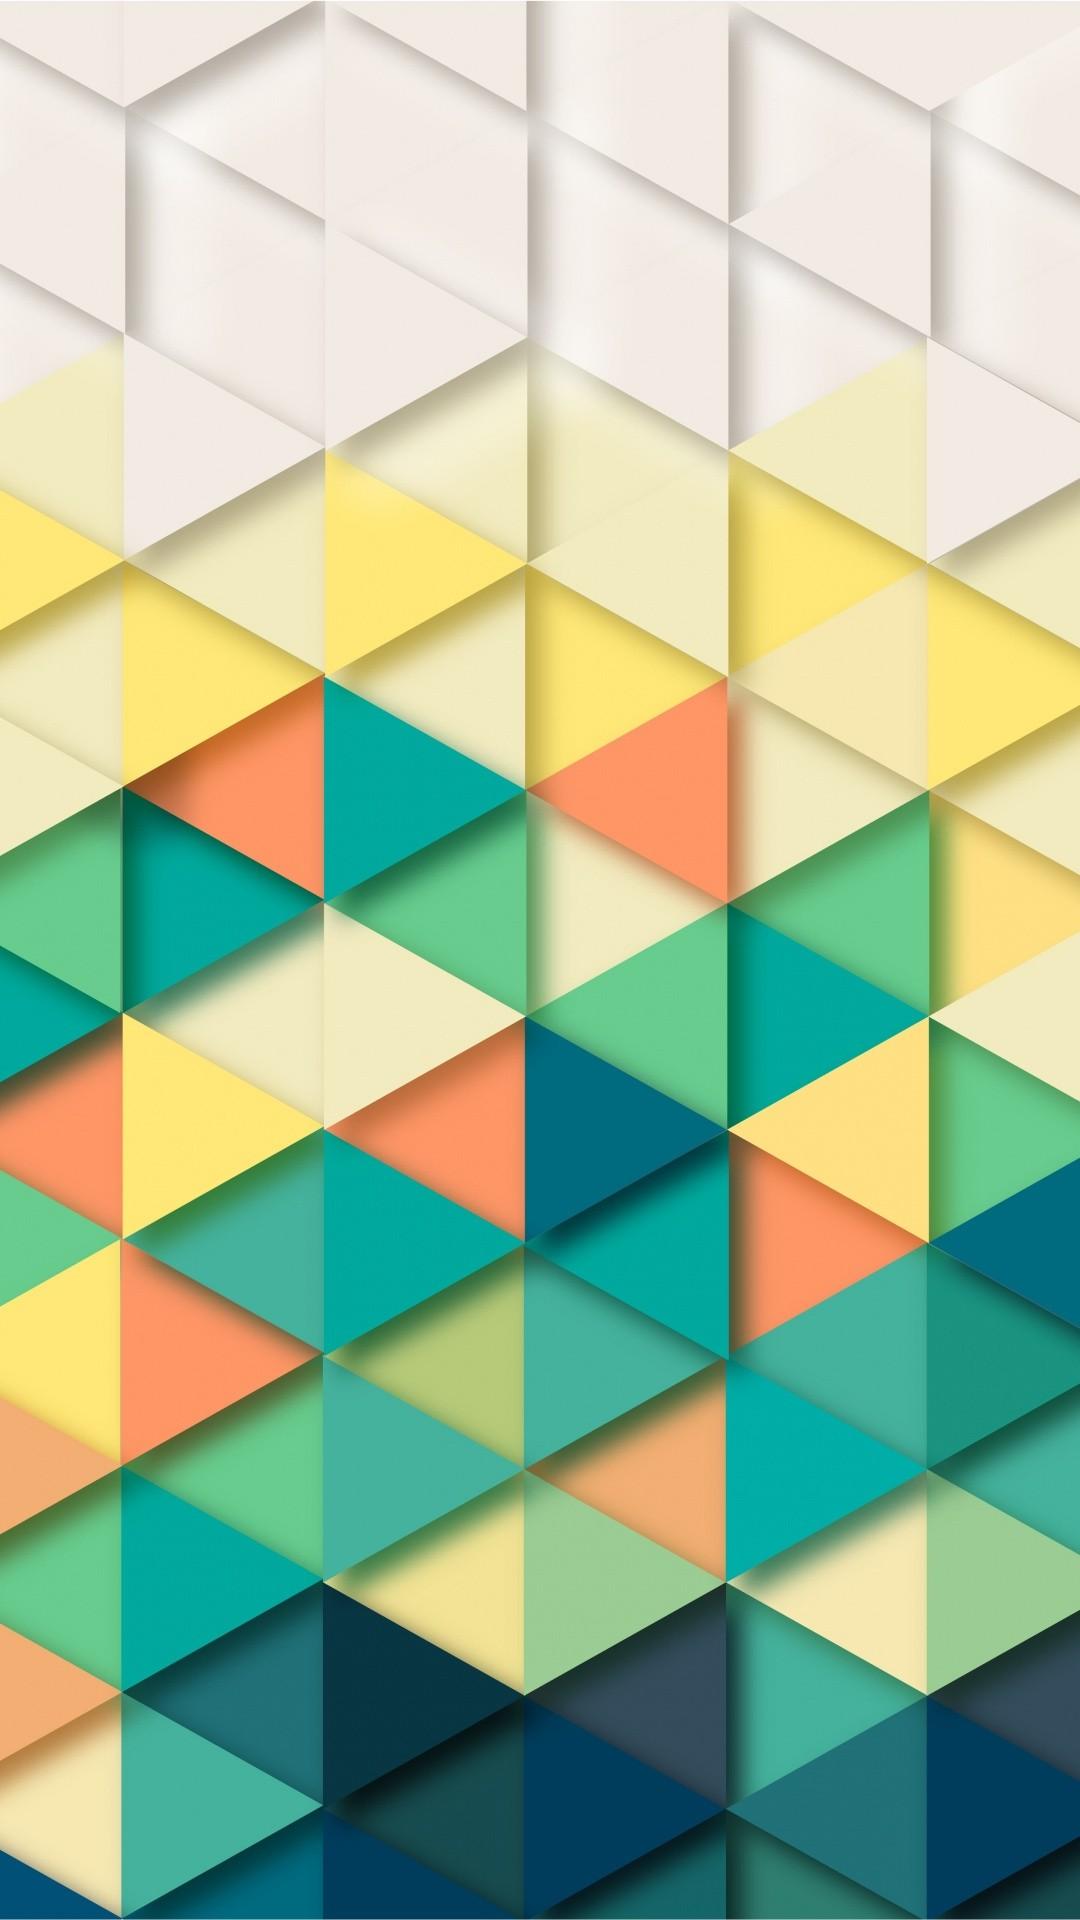 Geometric hd wallpaper for iphone